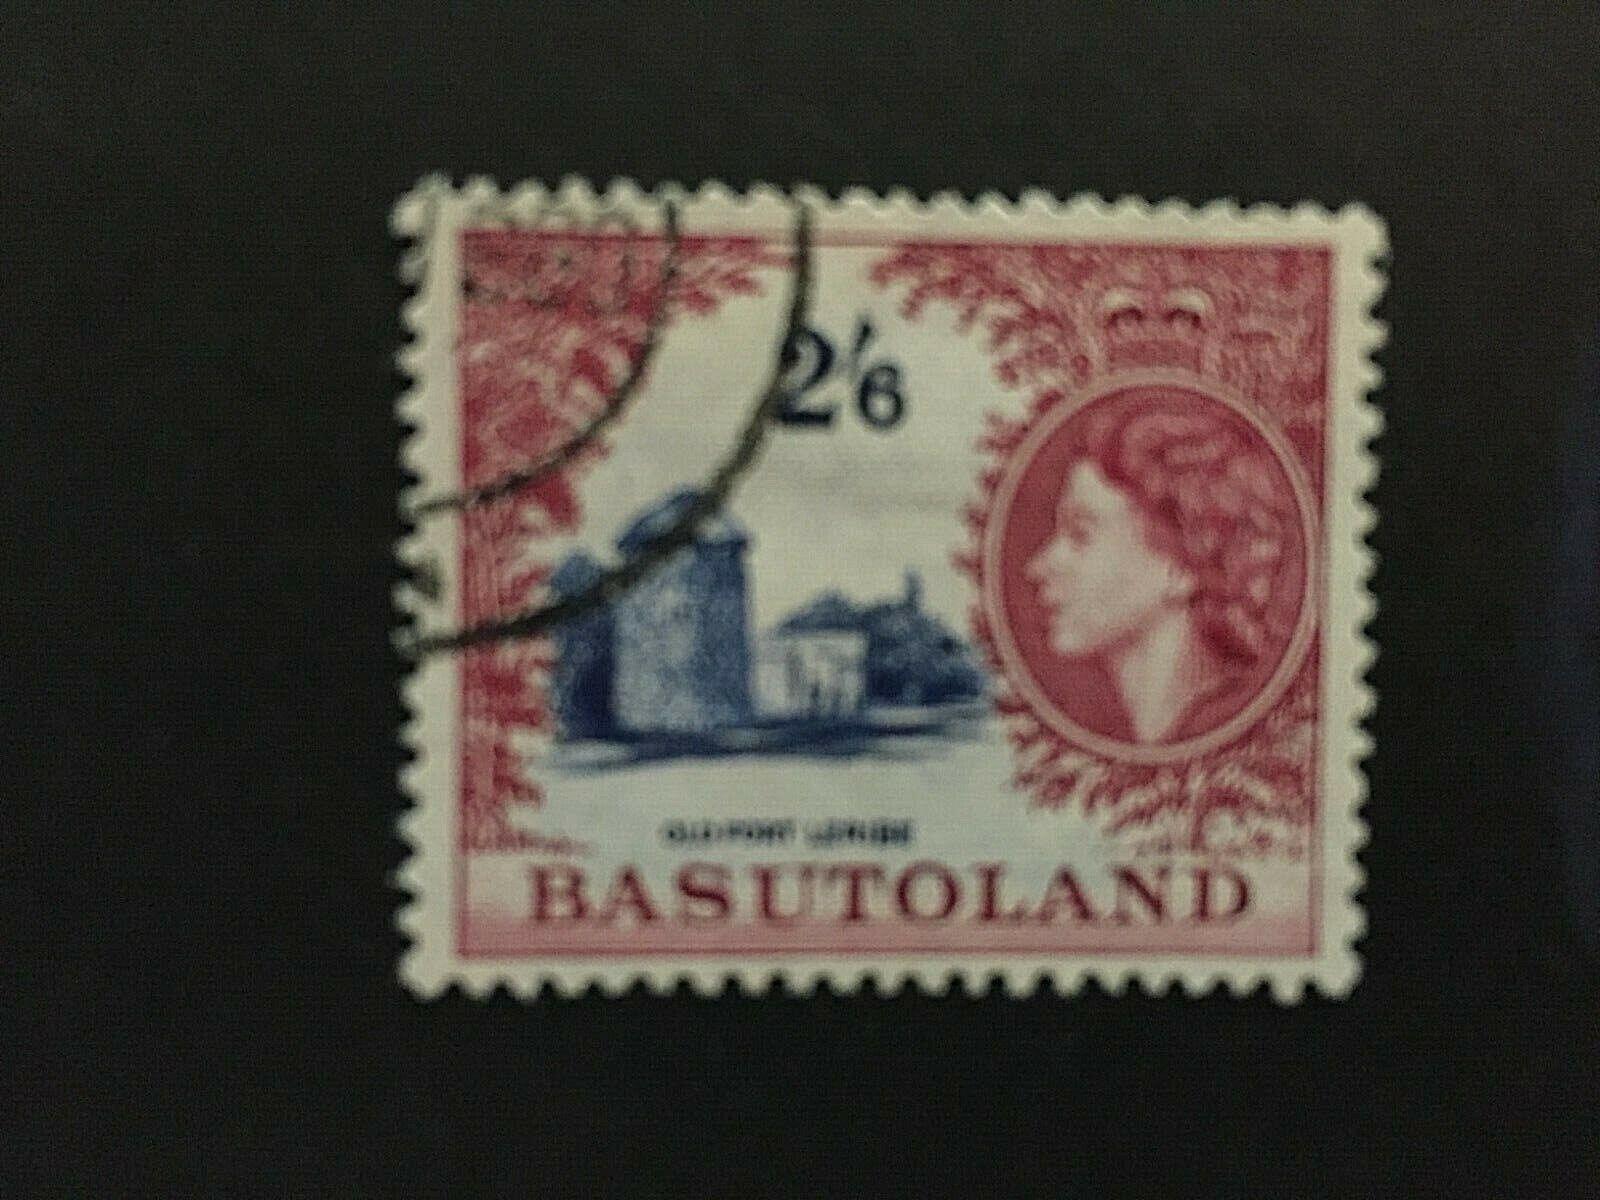 Basutoland: 1954, Queen Elizabeth definitive 2/6, crimson lake shade, SG 51a, FU